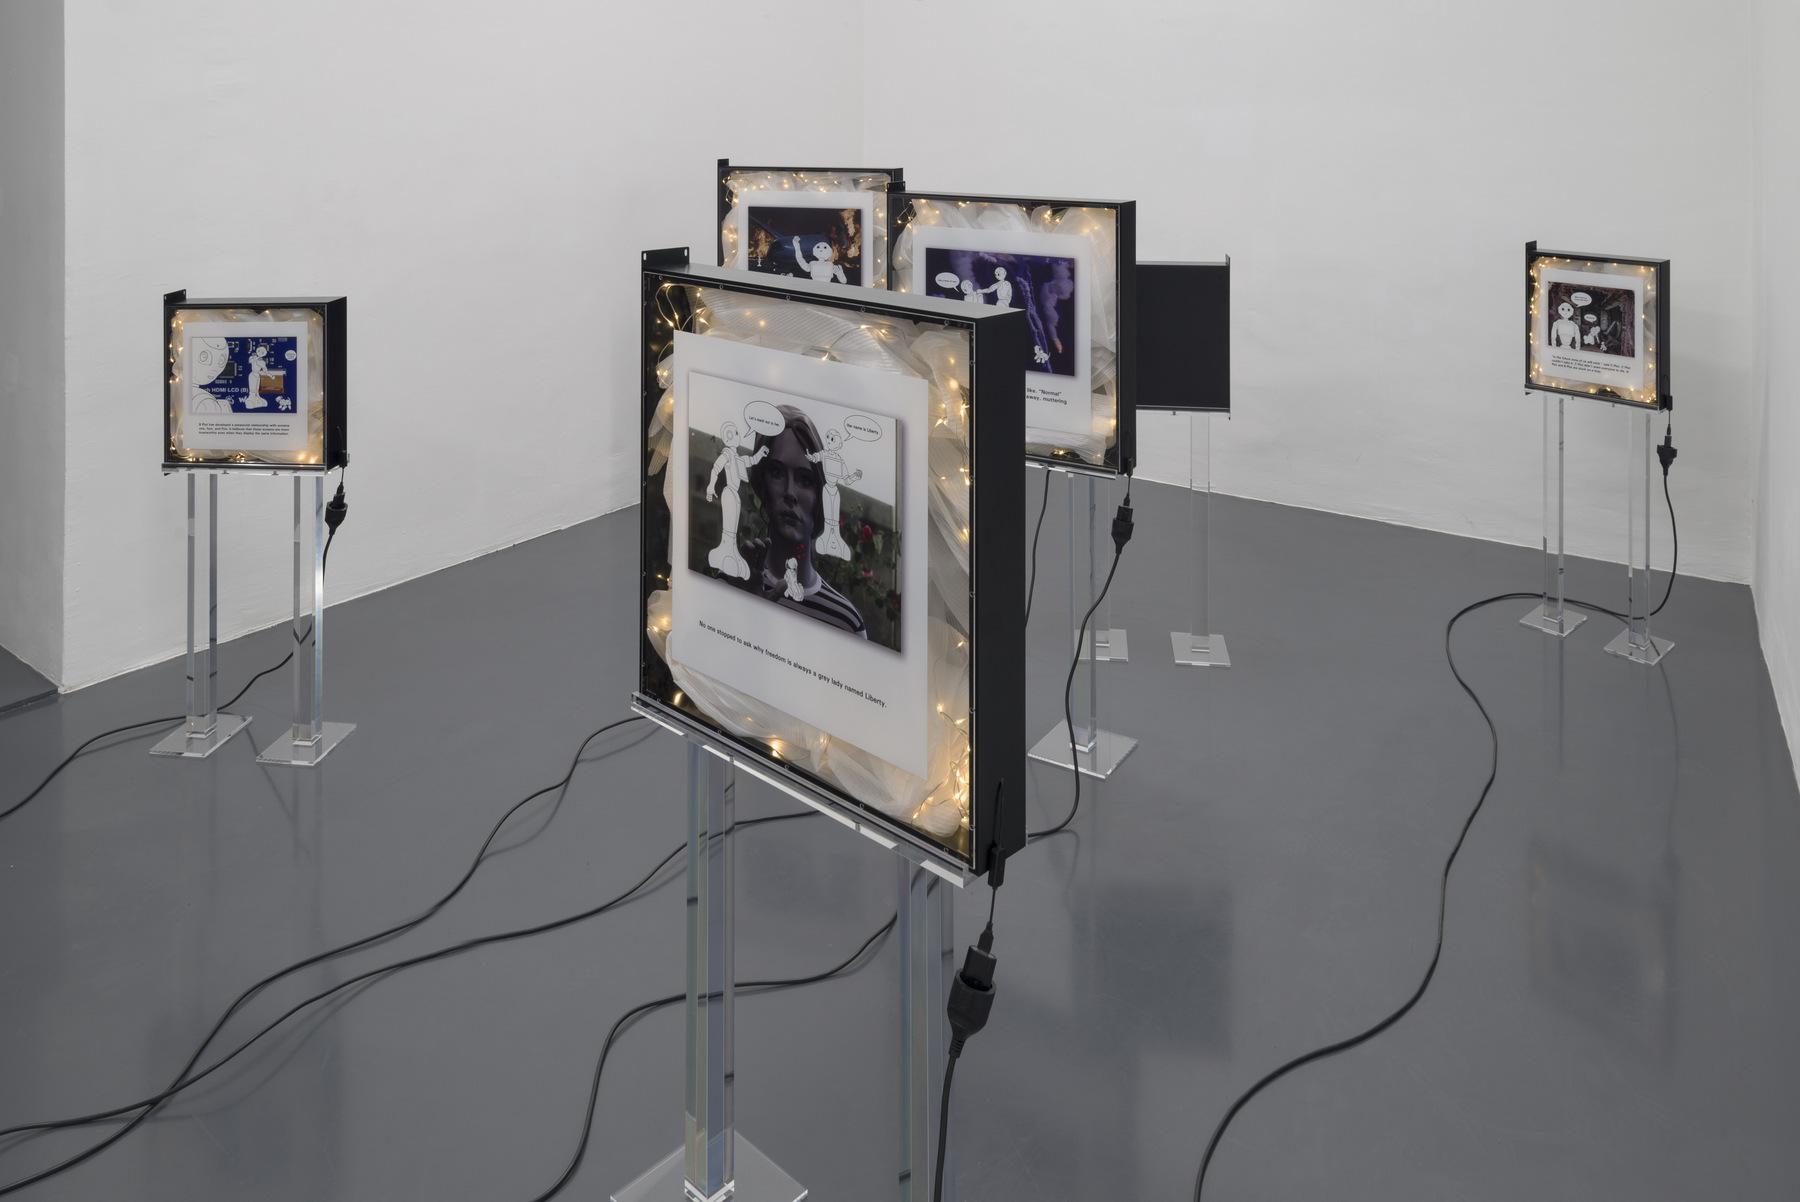 17_Cécile B. Evans_Galerie Emanuel Layr Vienna